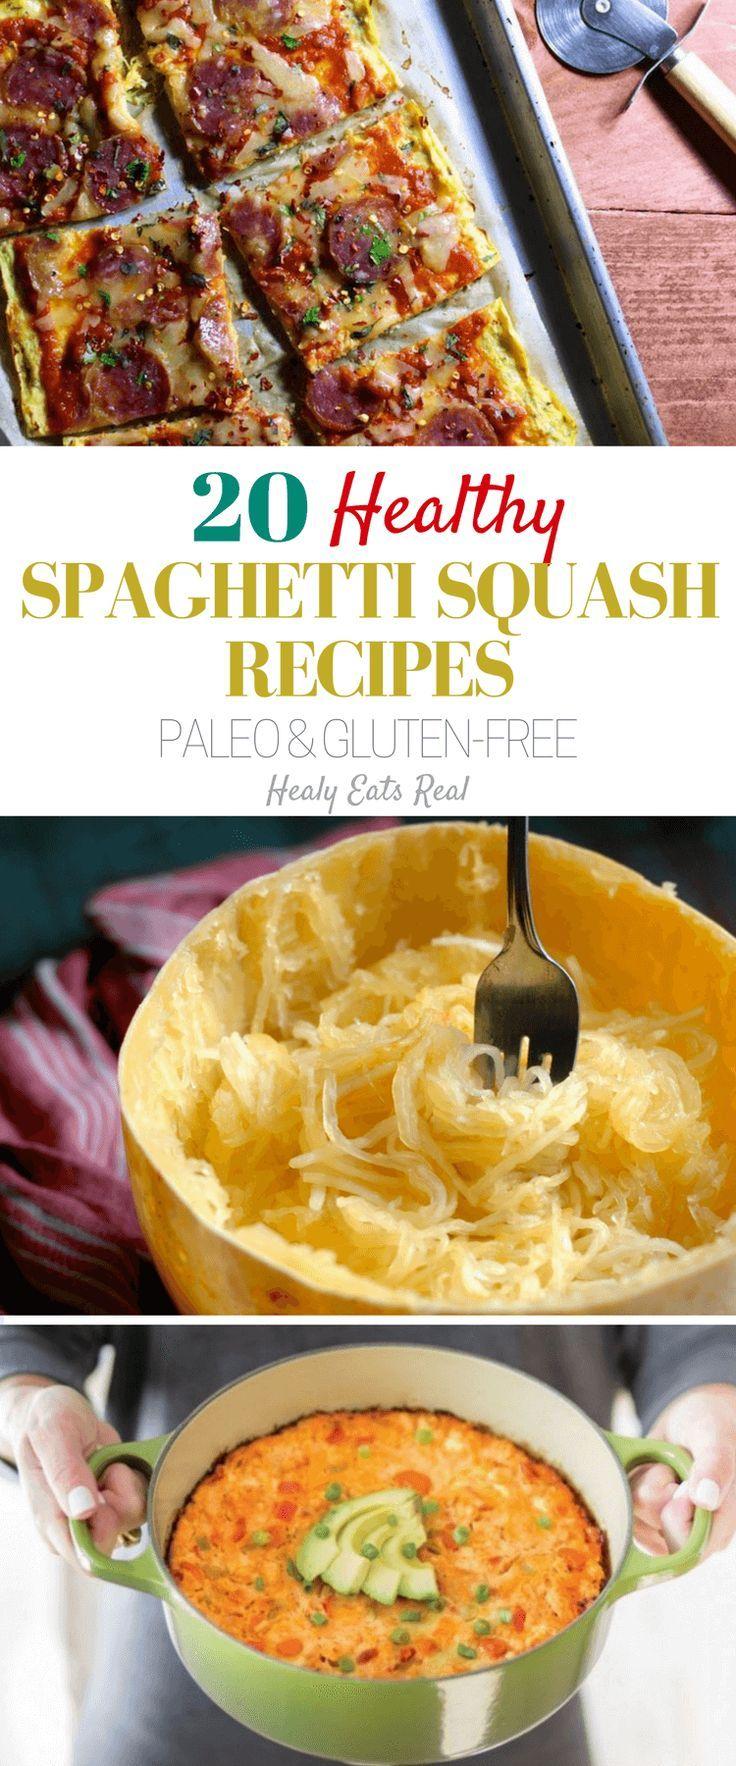 20 Incredible Healthy Spaghetti Squash Recipes (Paleo & GF)